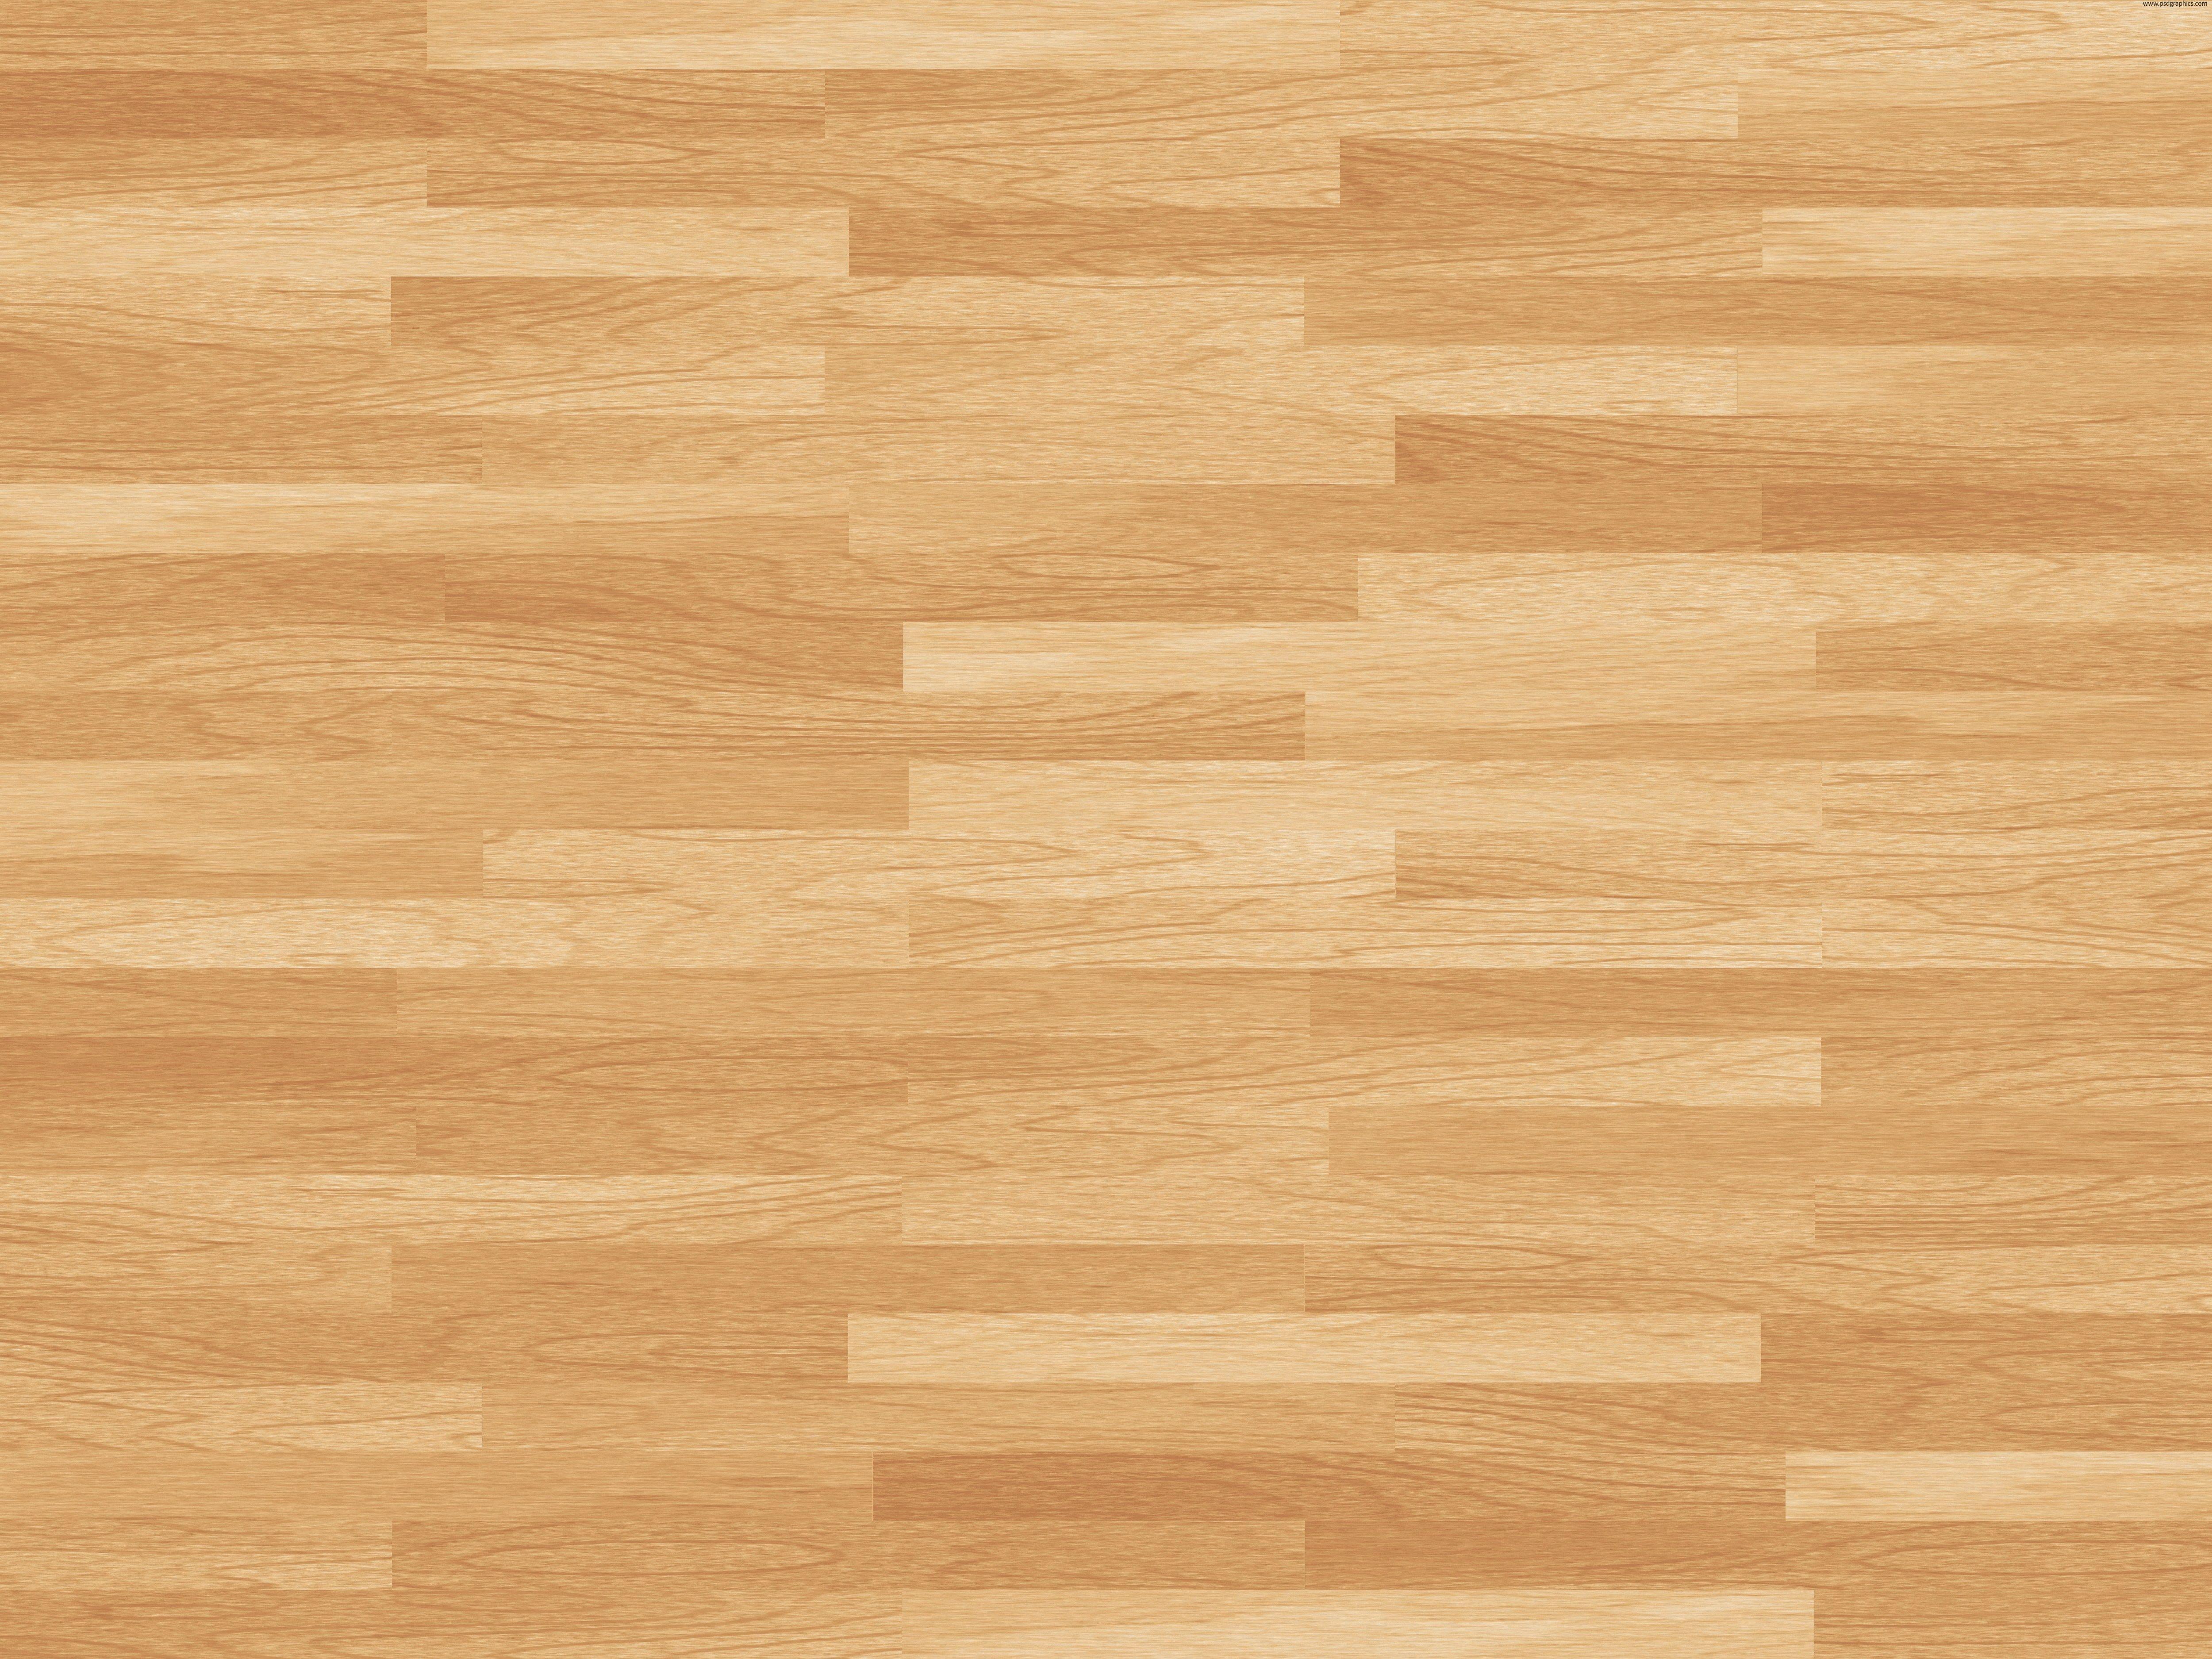 89 Hardwood Floors Texture By Armandina Fusco Desain Interior Desain Interior